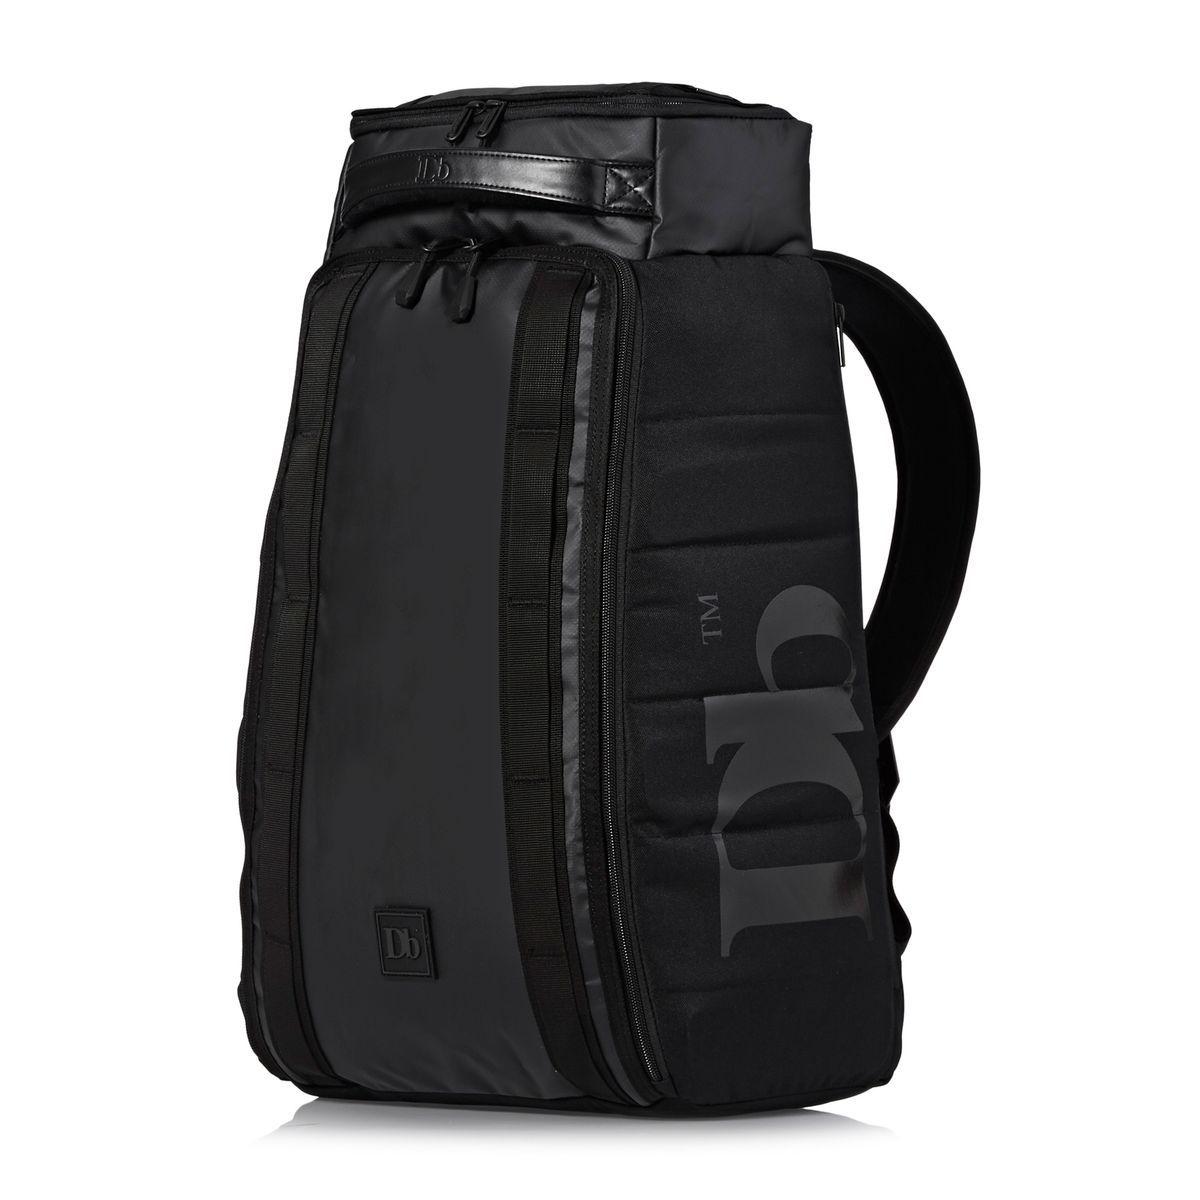 The Hugger 30L Backpack